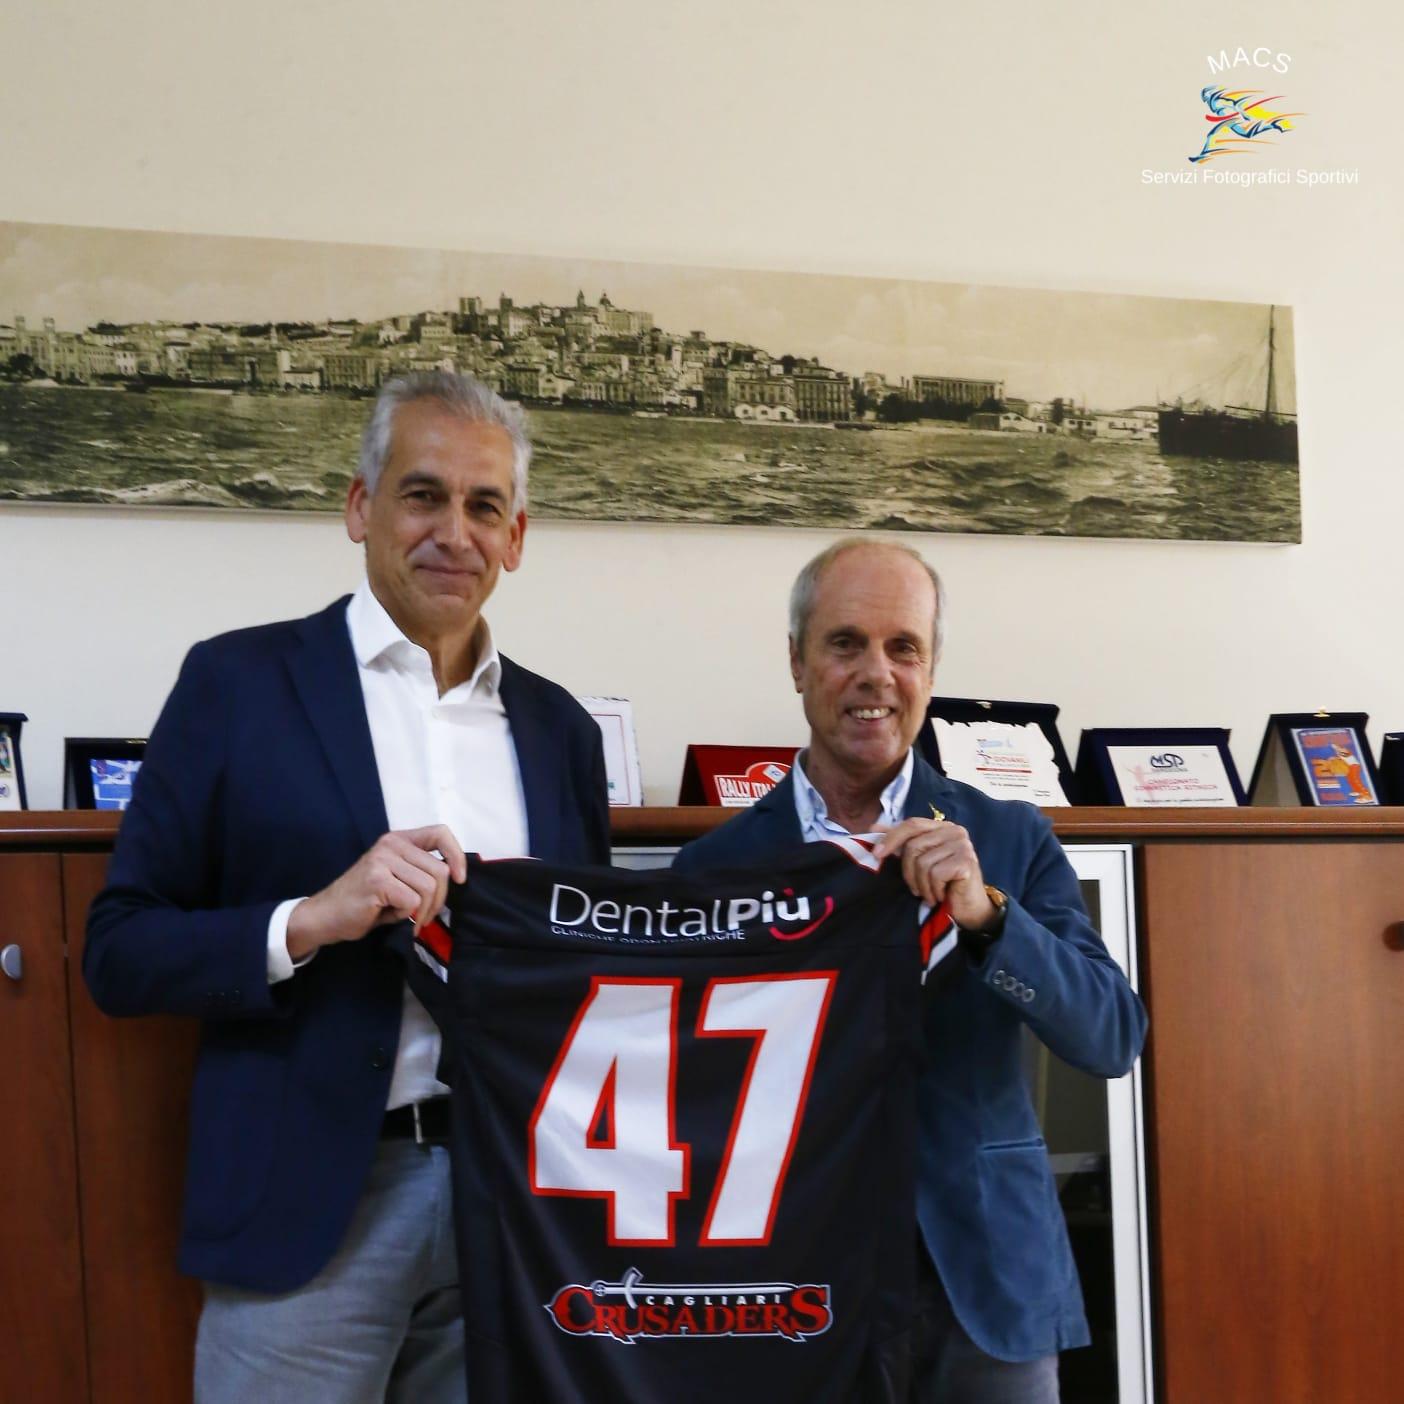 Emanuele Garzia e Paolo Spano